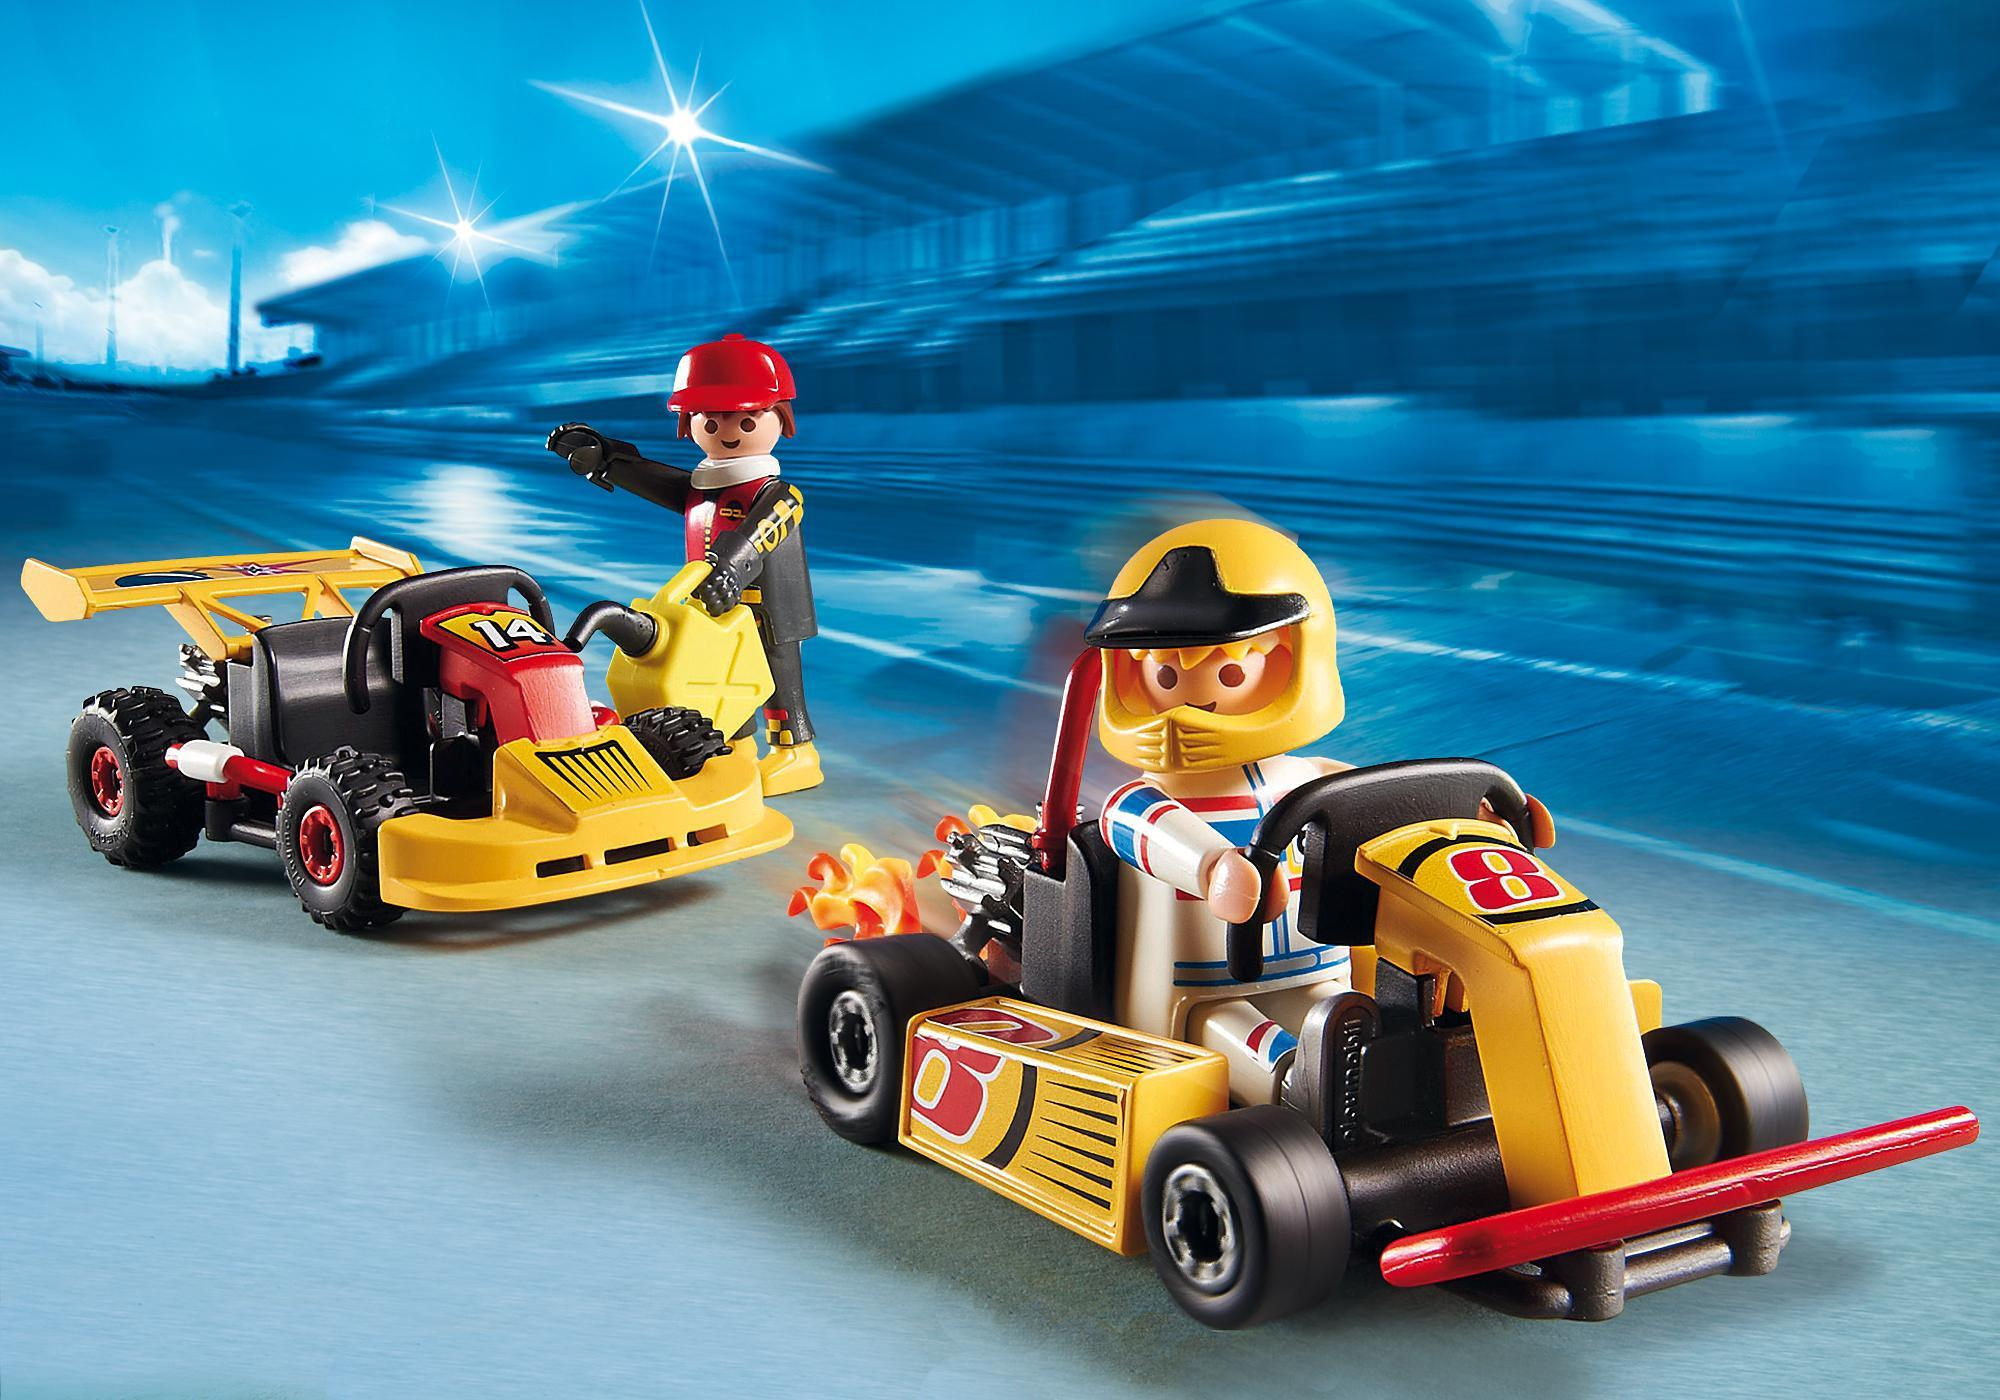 http://media.playmobil.com/i/playmobil/6869_product_extra1/StarterSet Taller de Karts